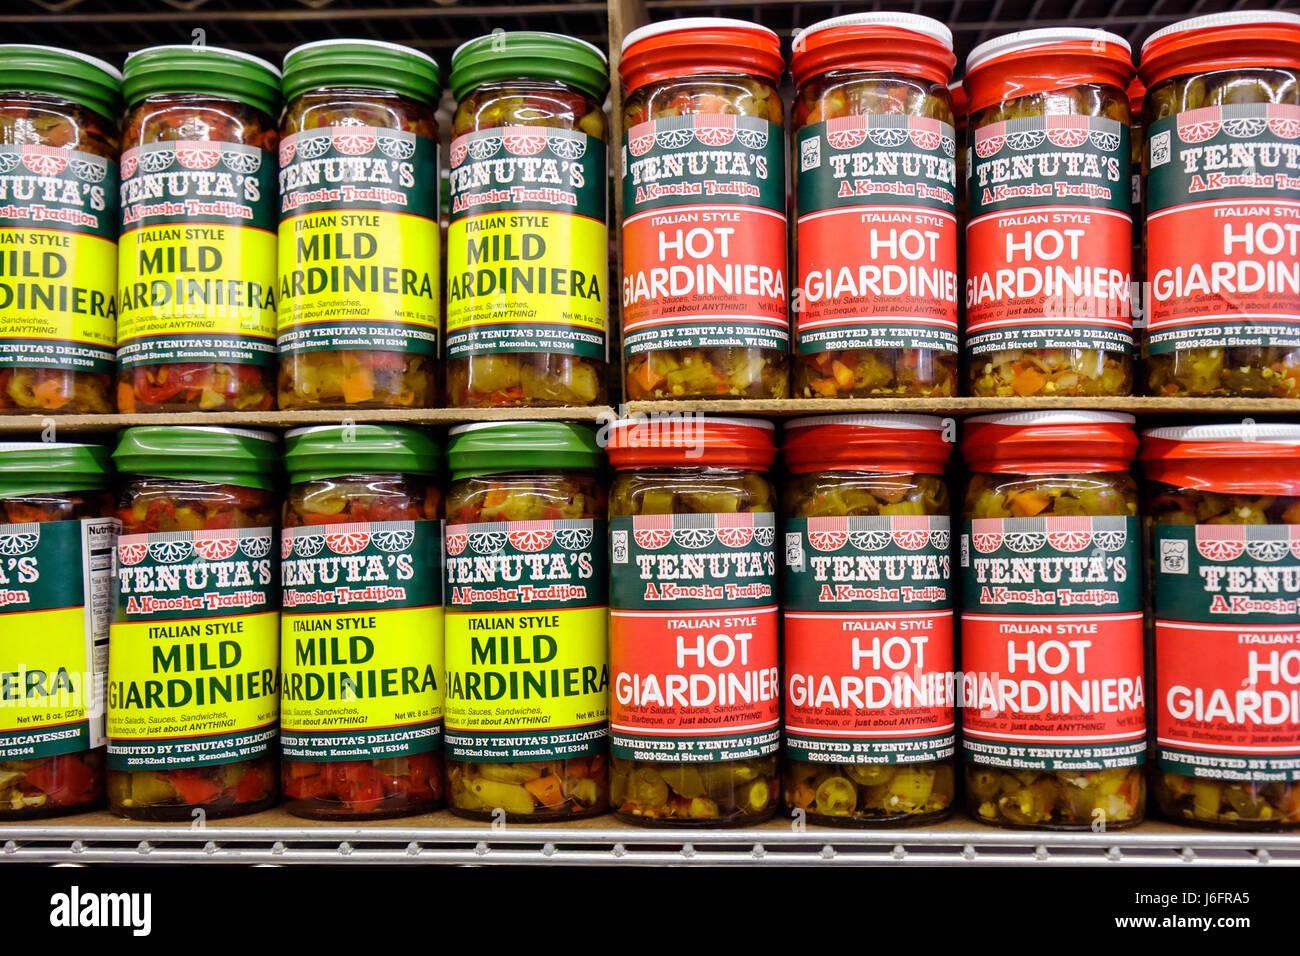 Wisconsin Kenosha Tenuta's Delicatessen Liquors and Wines Italian market bottles jars store brands pickled vegetables - Stock Image